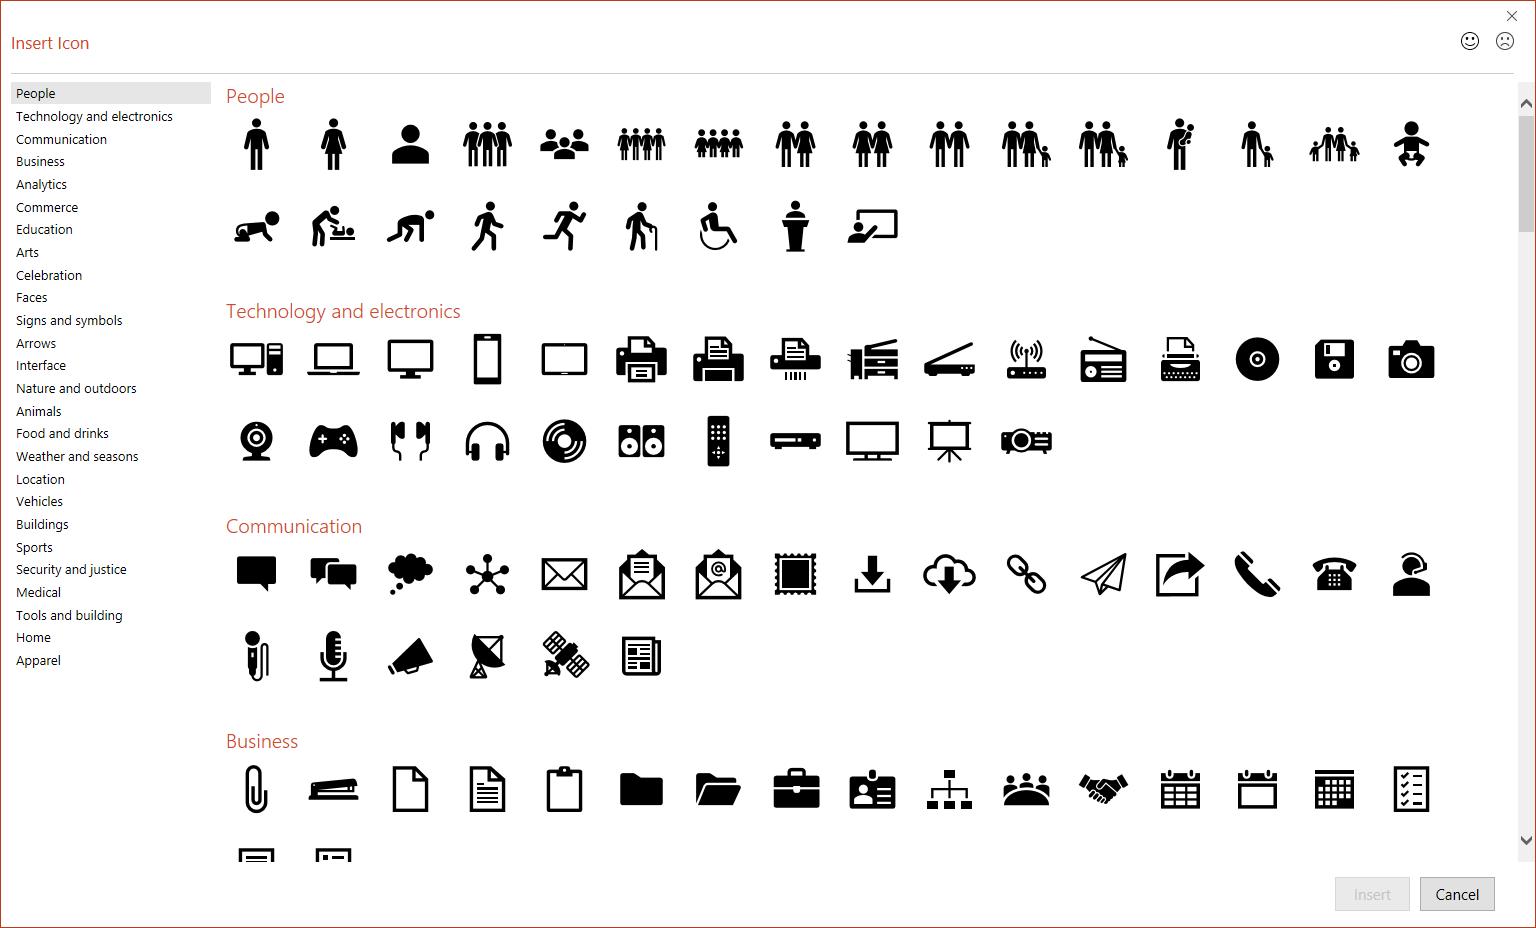 PowerPoint Insert Icons window